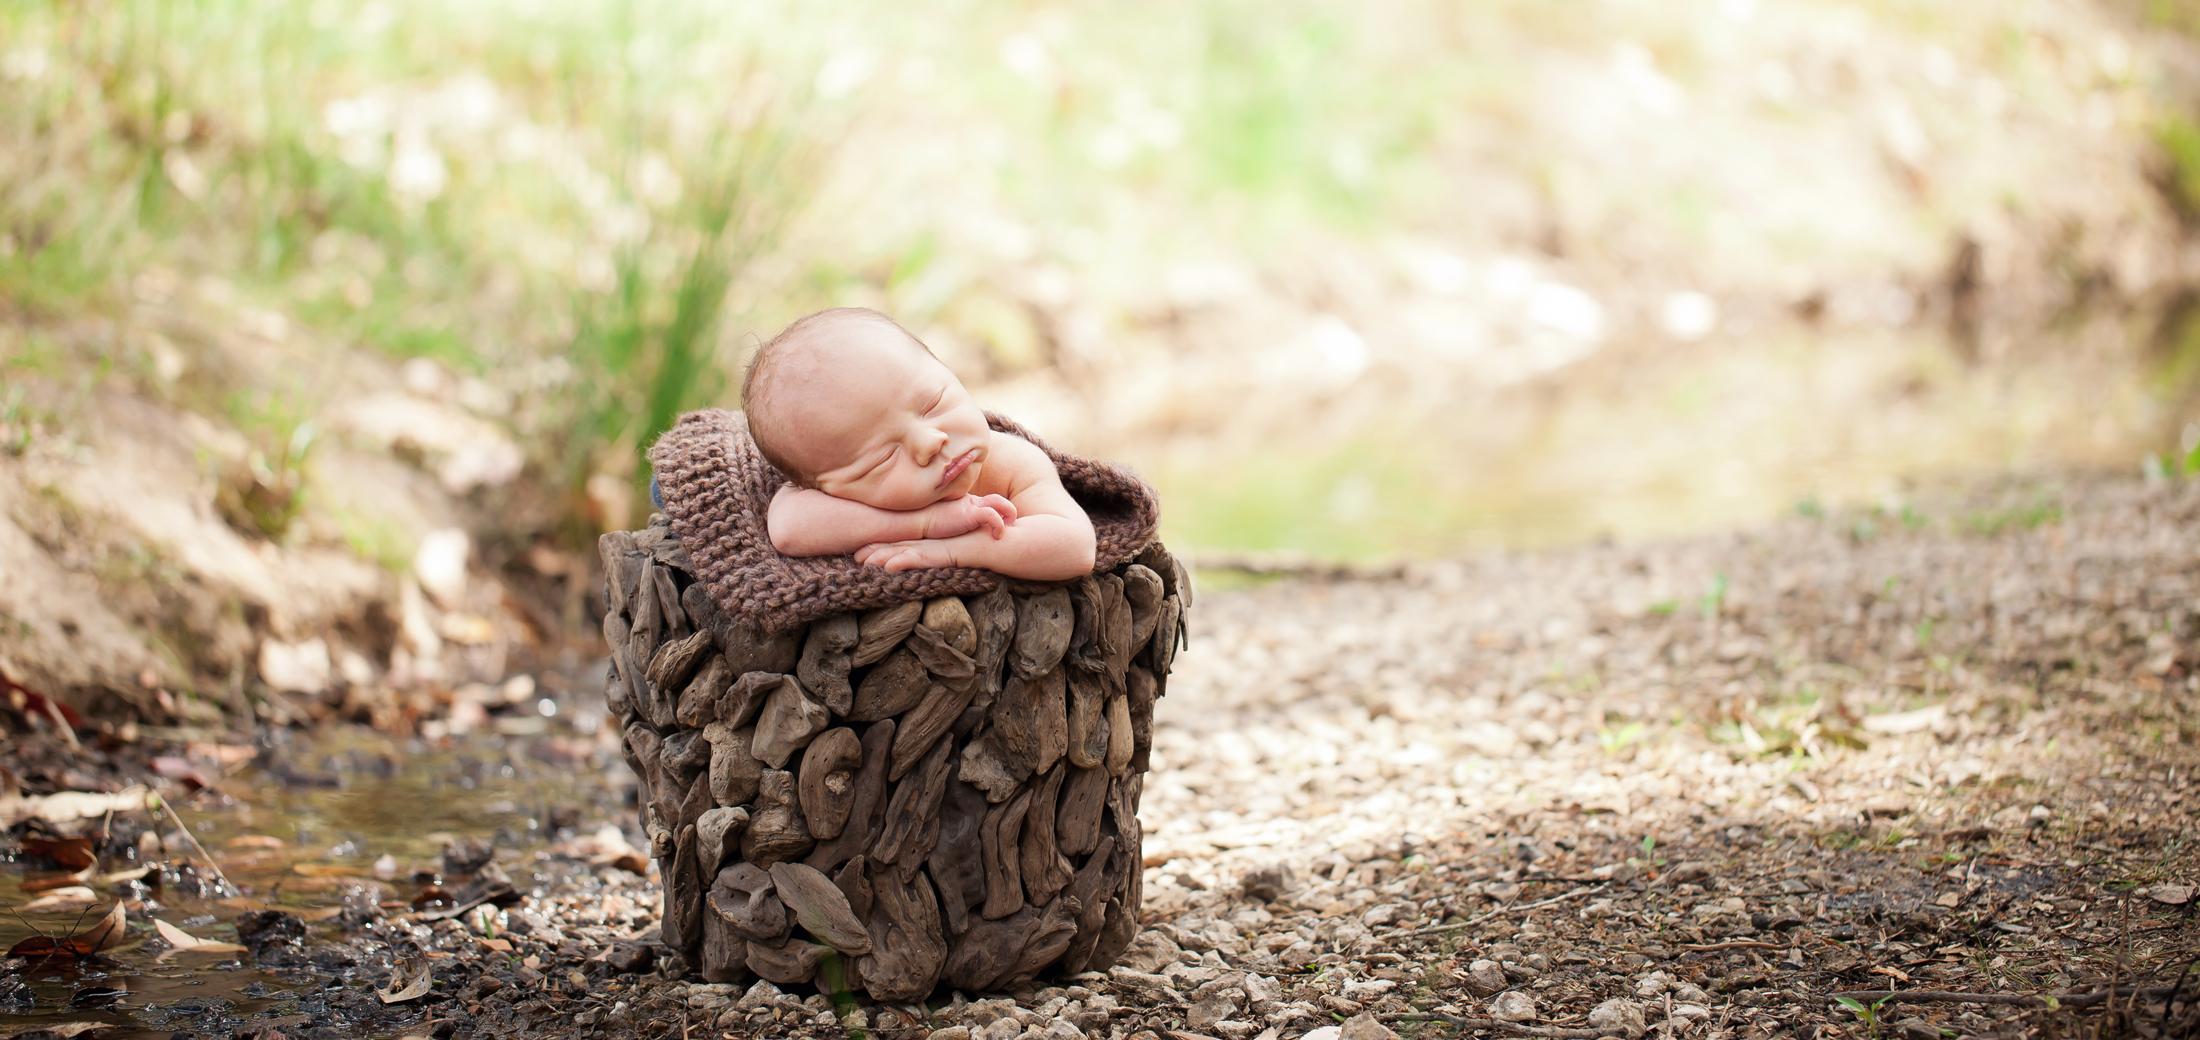 newborn photography terrigal nsw